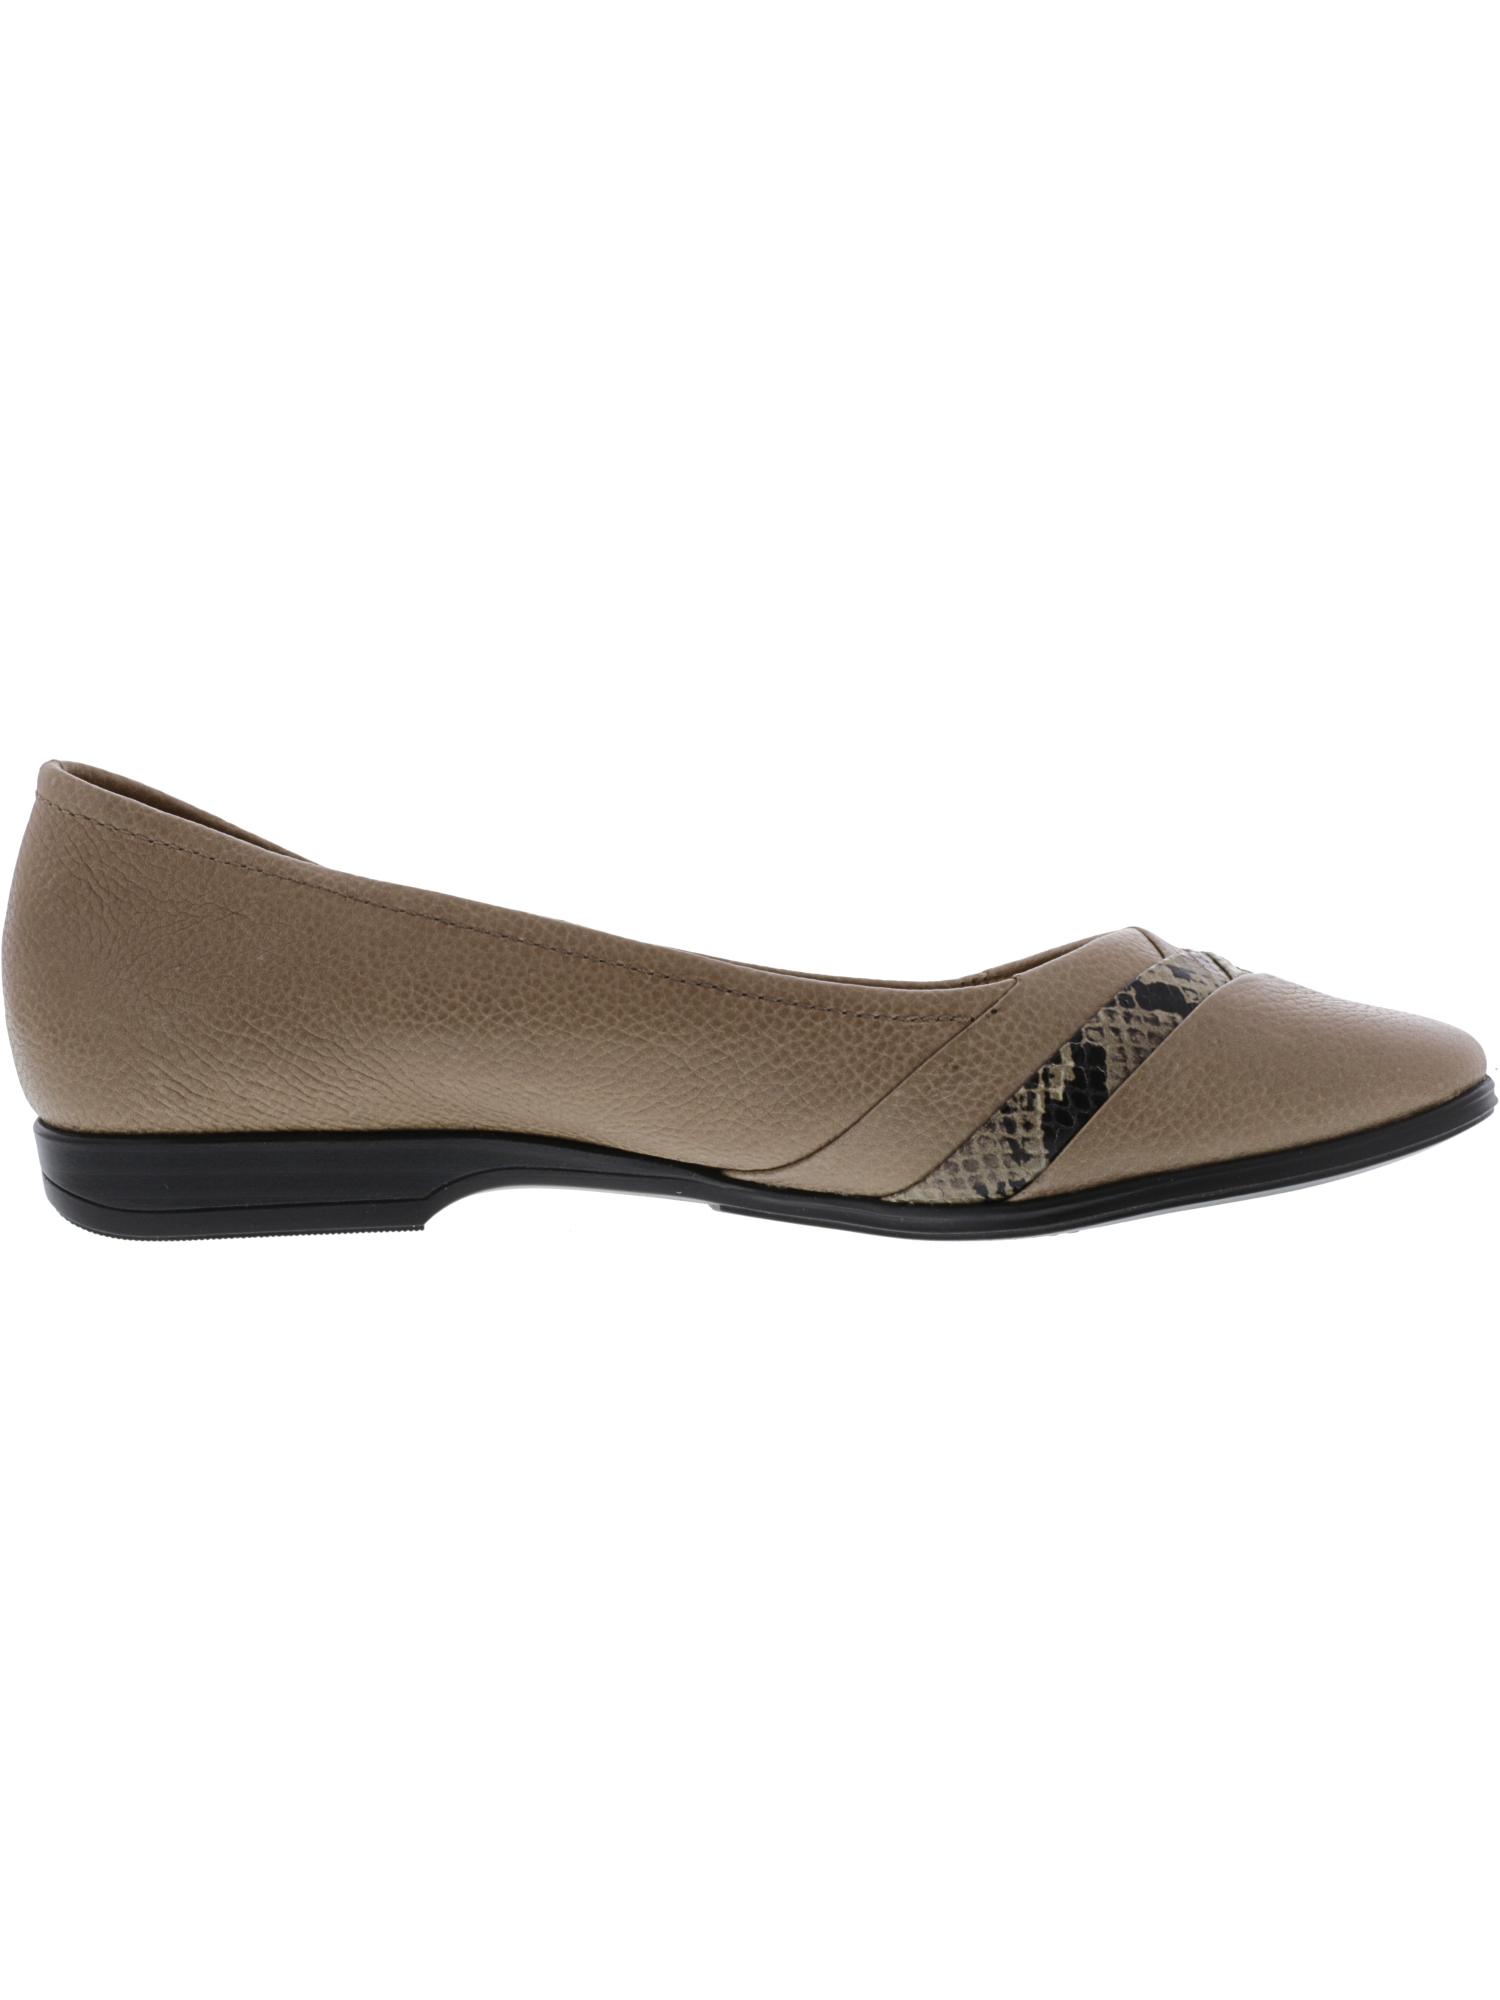 Naturalizer-Women-039-s-Jaye-Ankle-High-Leather-Flat-Shoe miniature 6